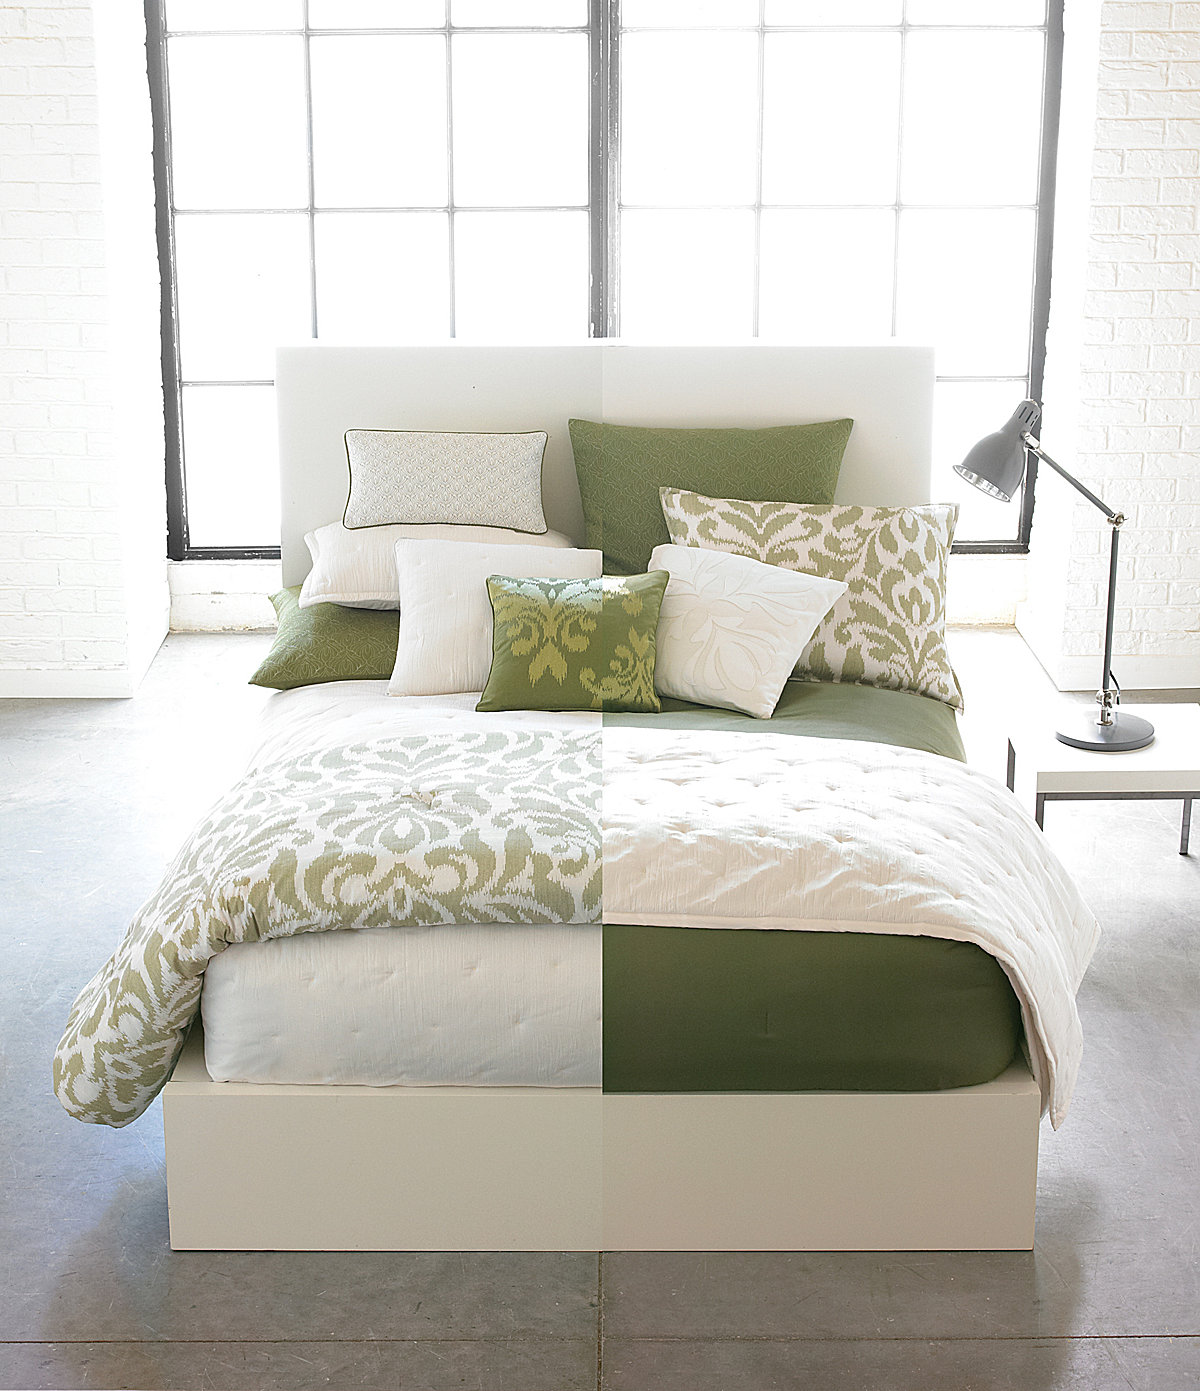 candice olson bedroom dillards photo - 8